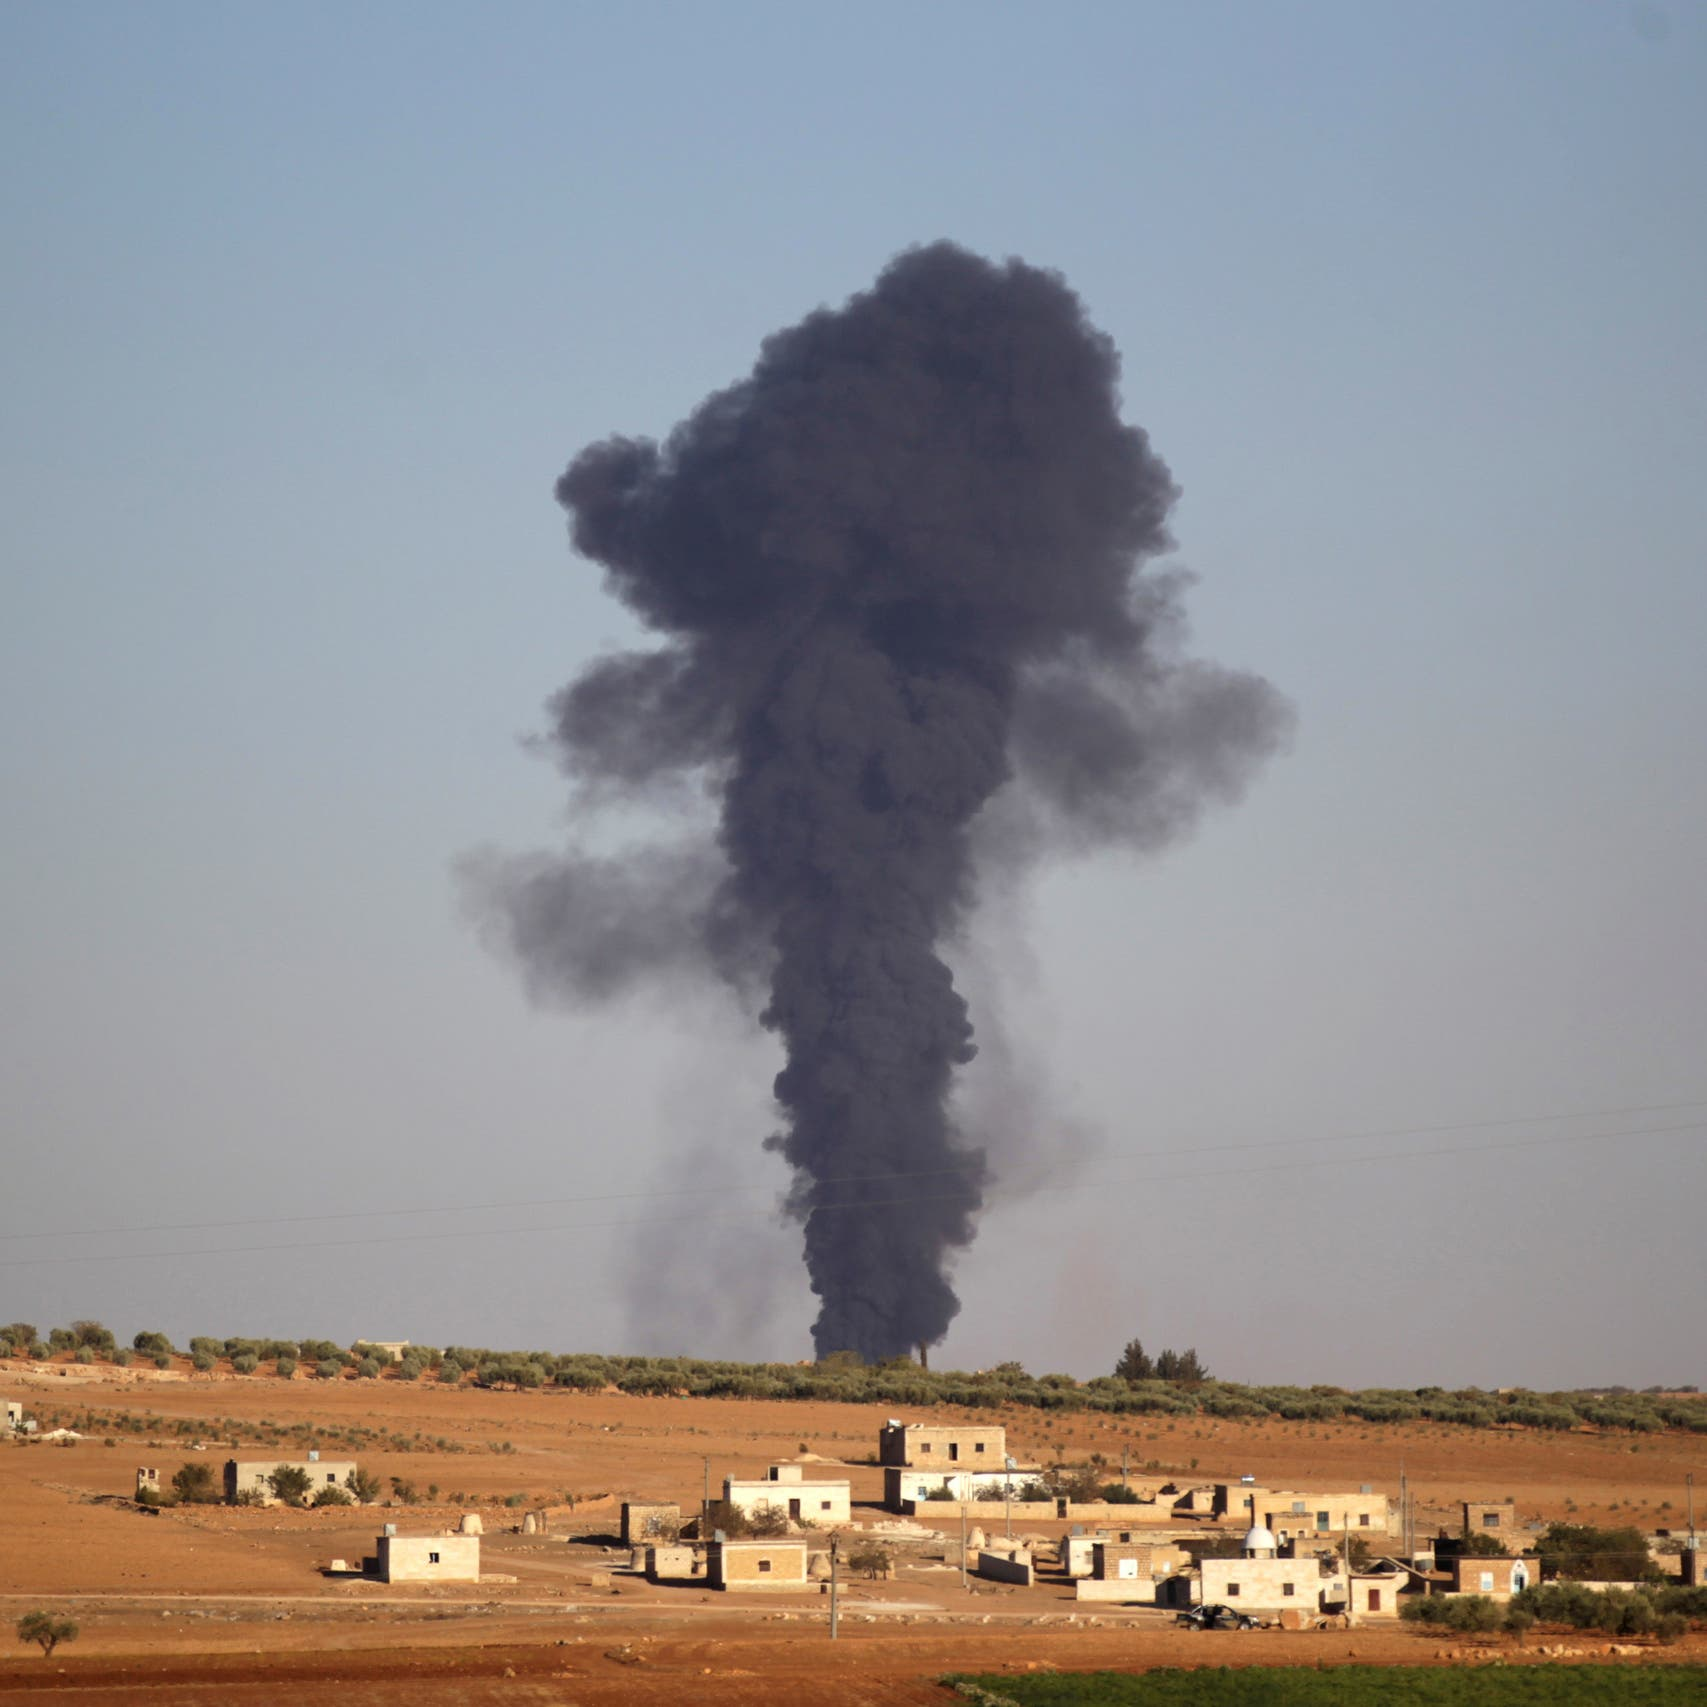 مقتل قيادي بفصيل سوري موالٍ لتركيا بانفجار في ريف حلب